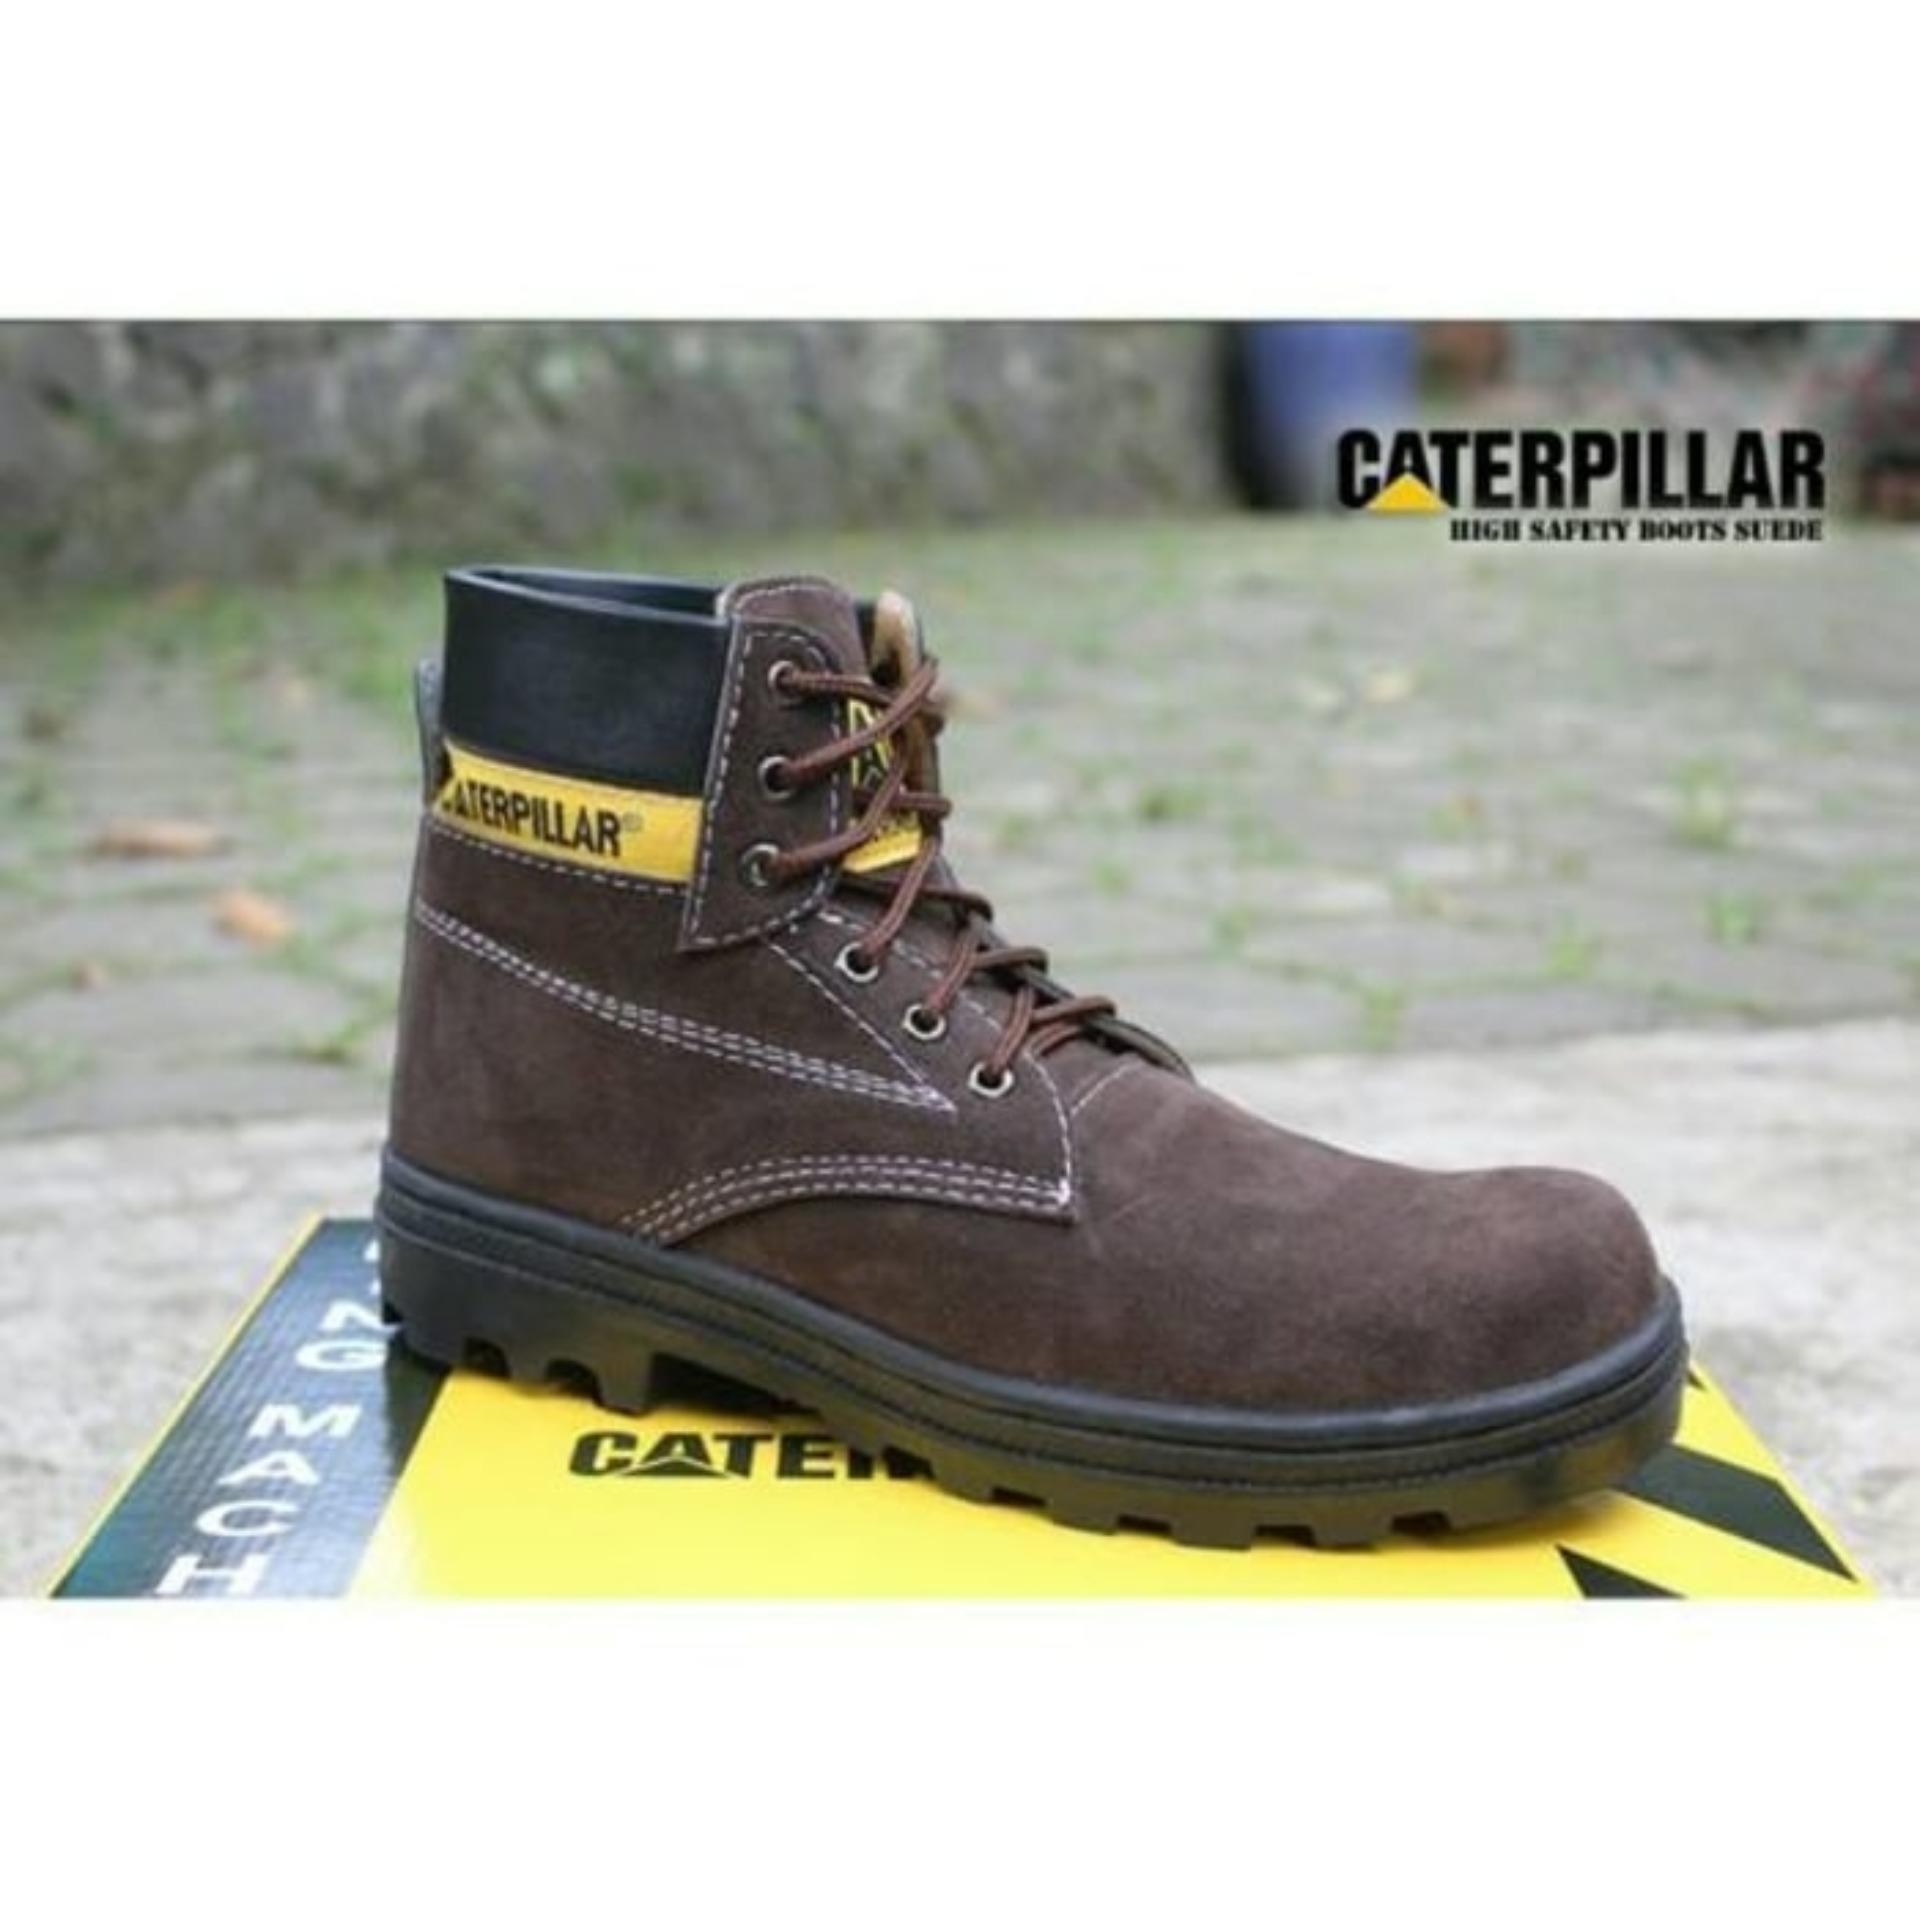 Caterpillar Sepatu safety boots